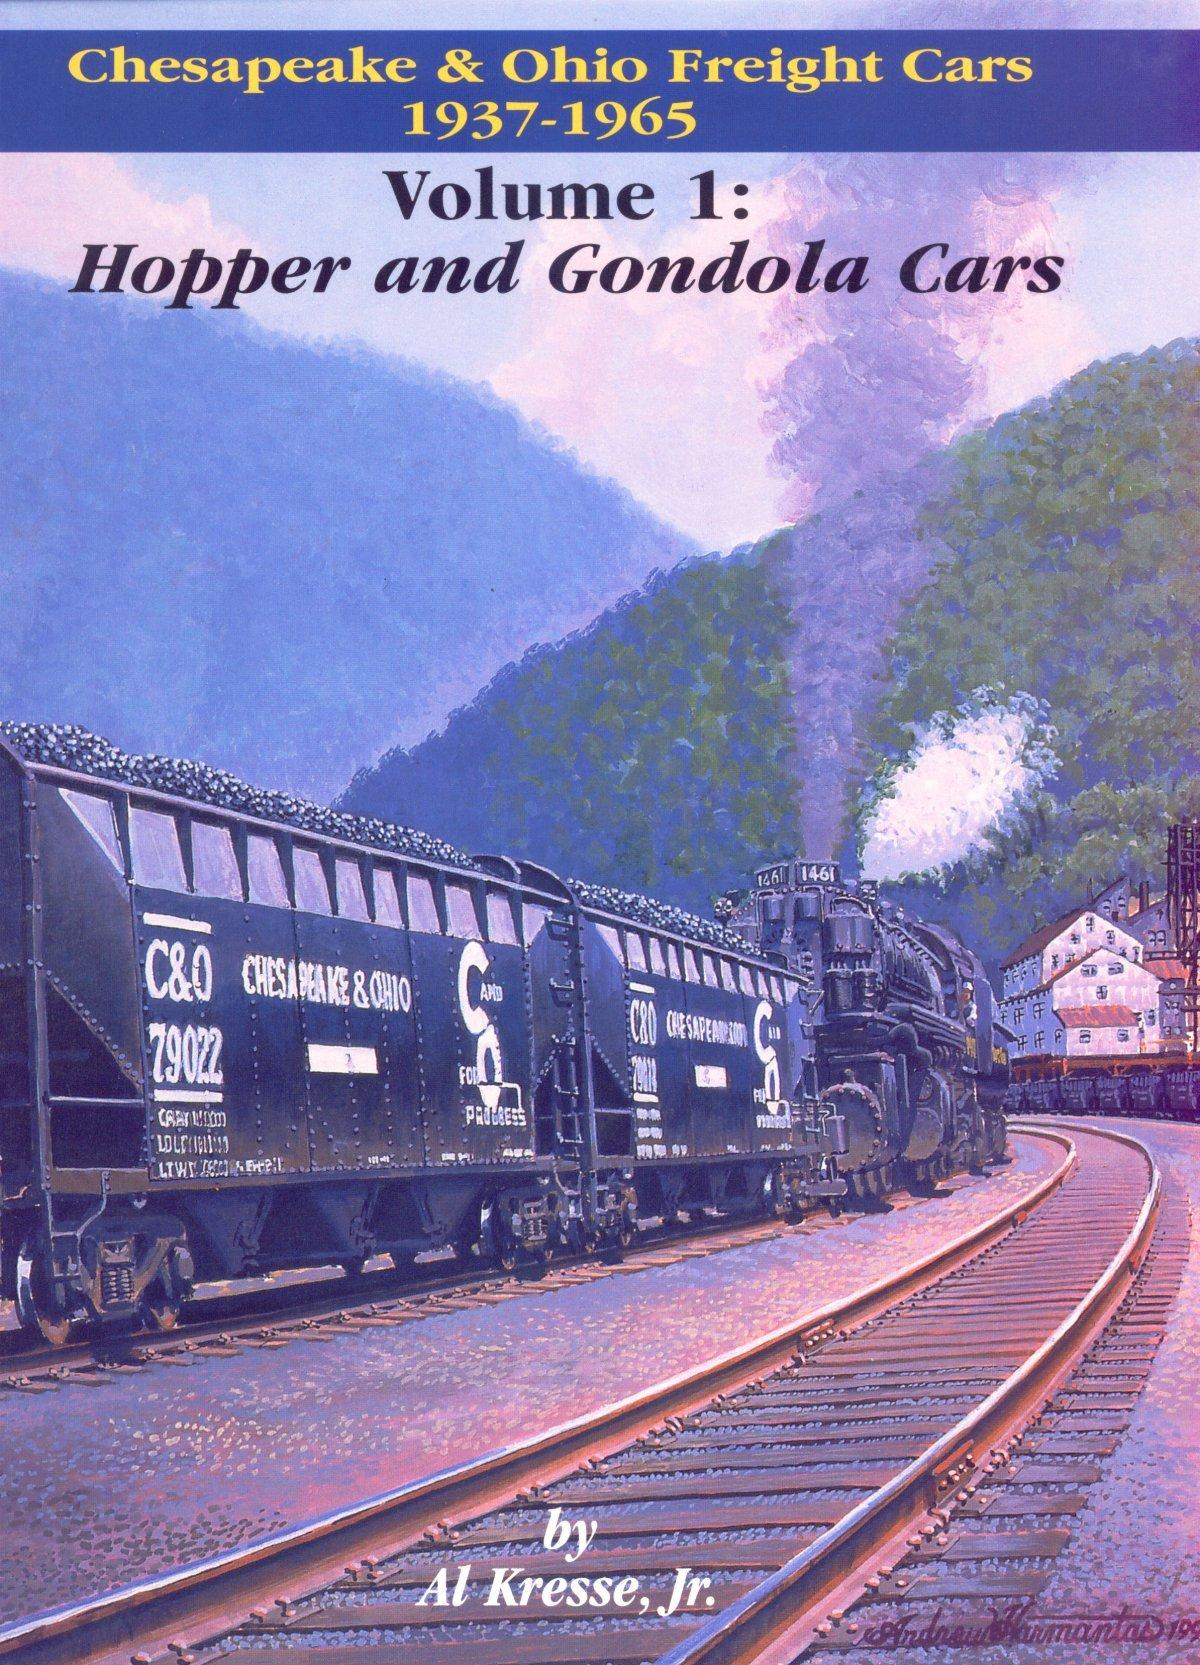 Chesapeake & Ohio freight cars, 1937-1965: Alfred L Kresse